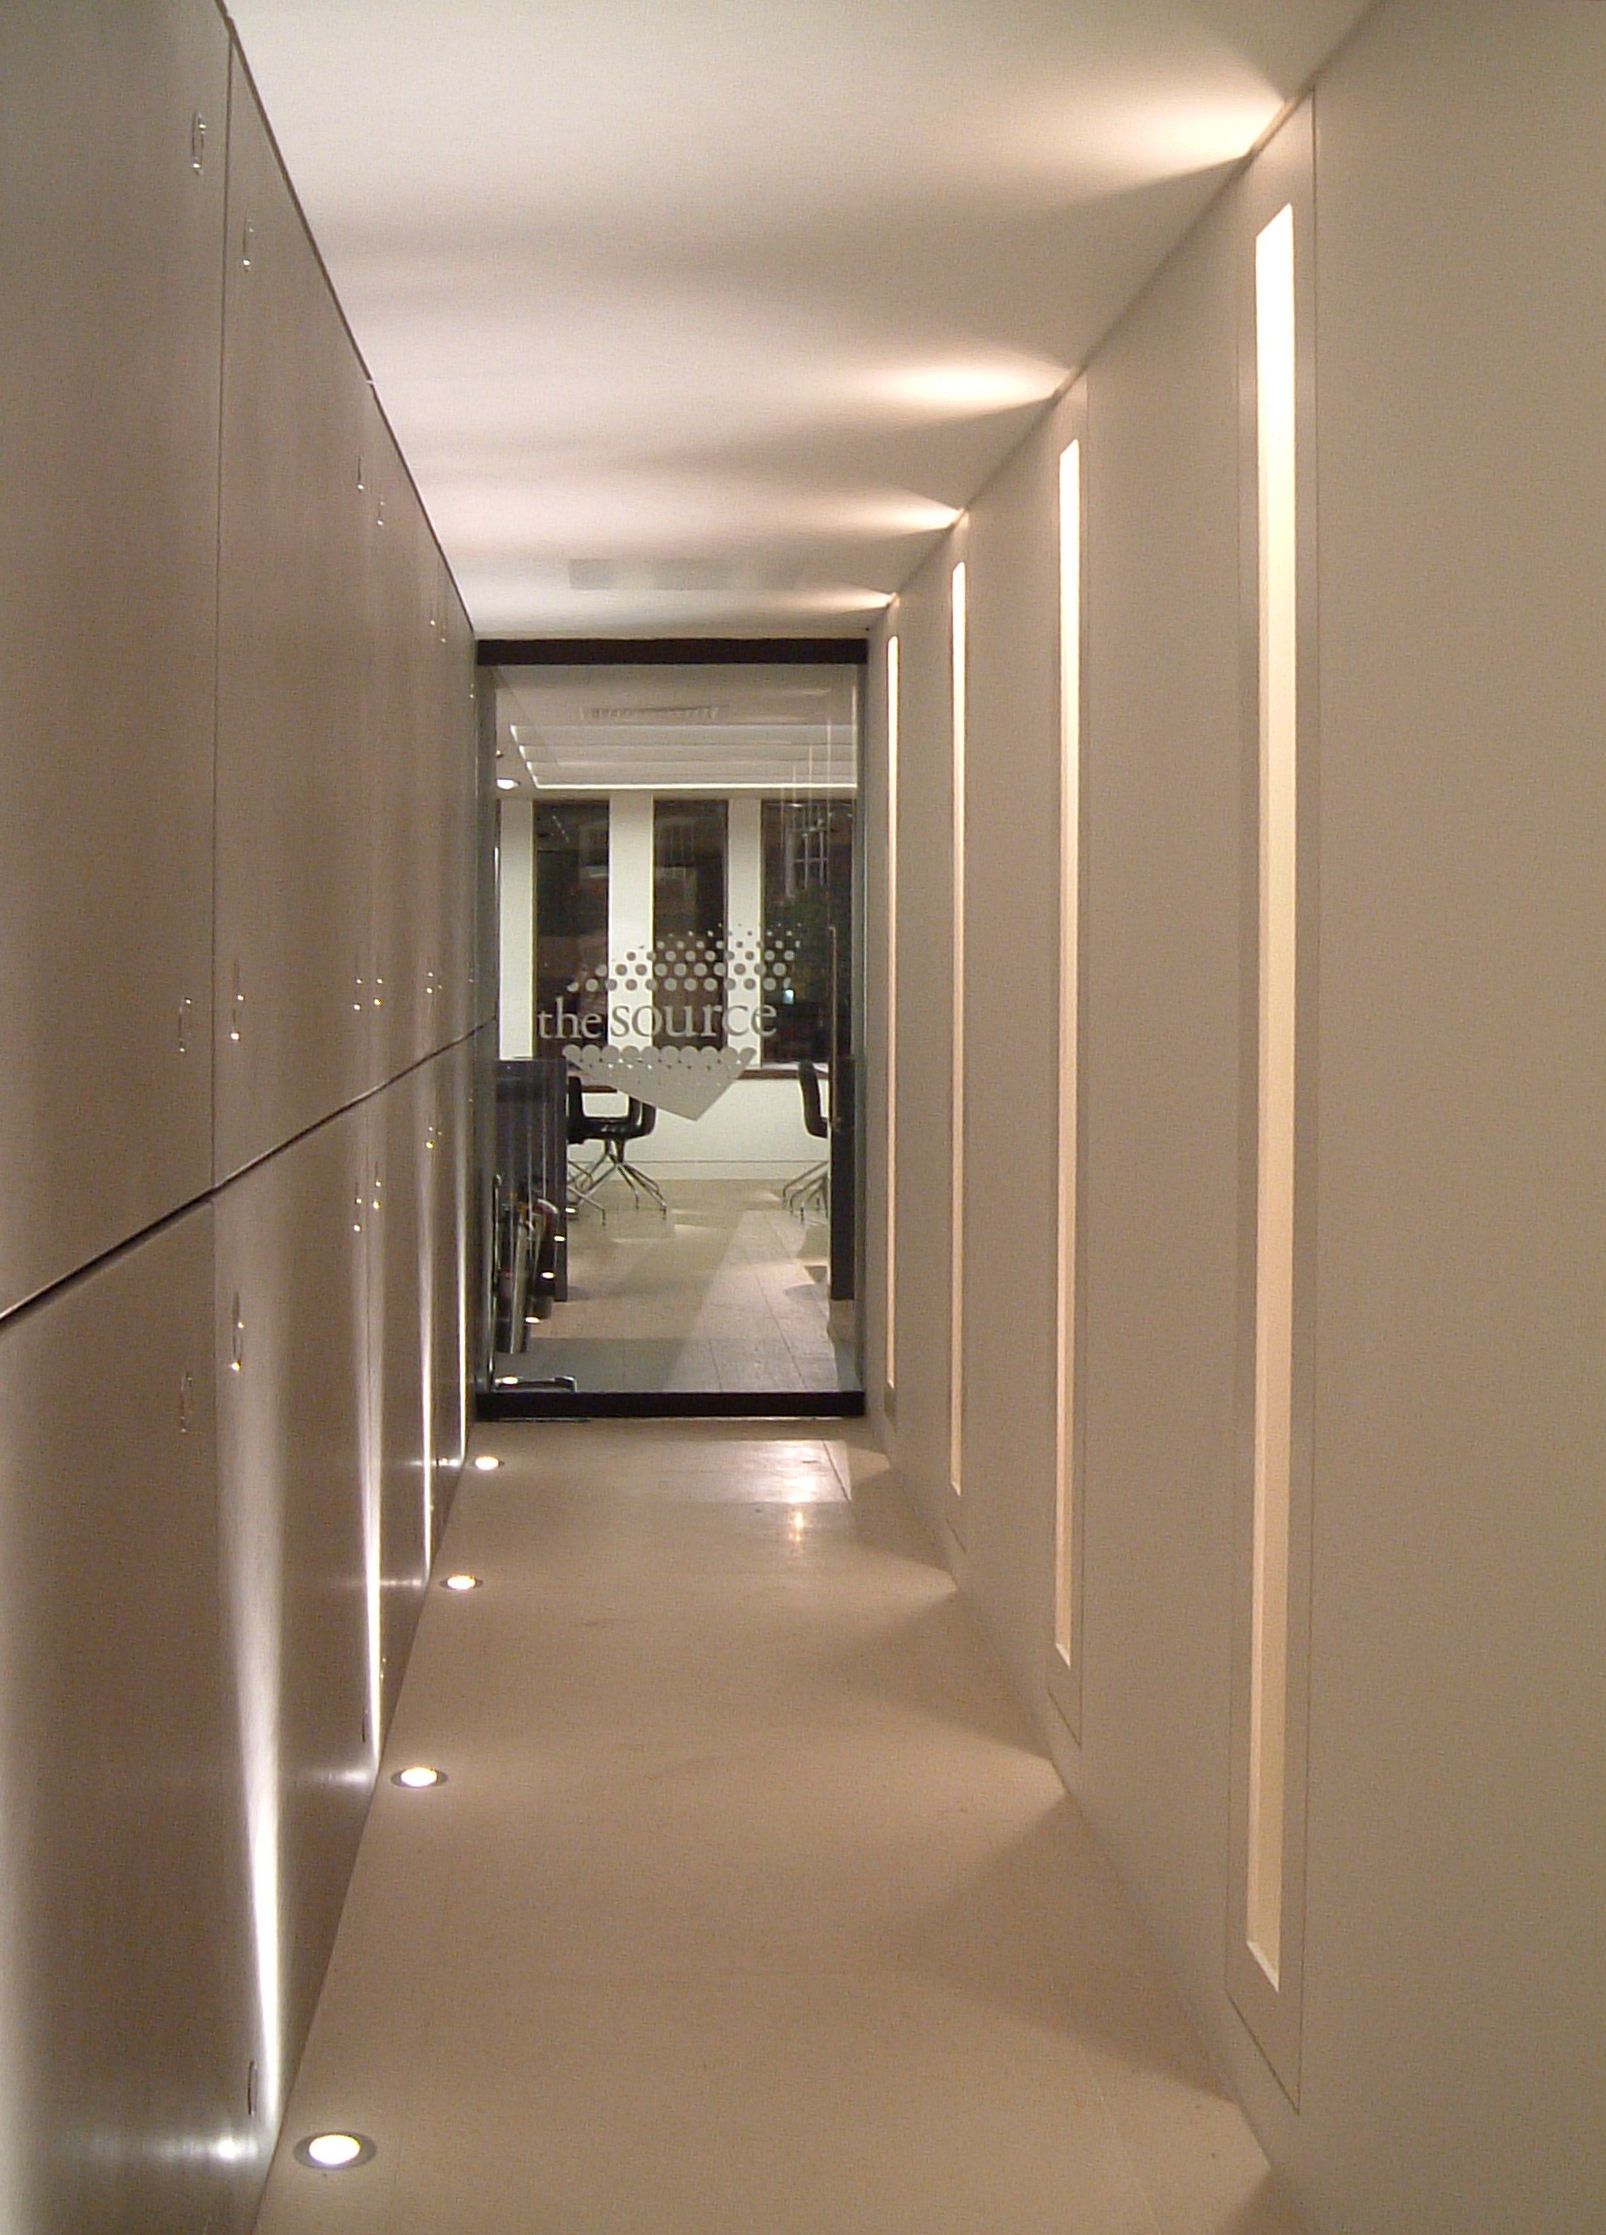 hammerson office lighting by lighting design international lighting offices pinterest. Black Bedroom Furniture Sets. Home Design Ideas